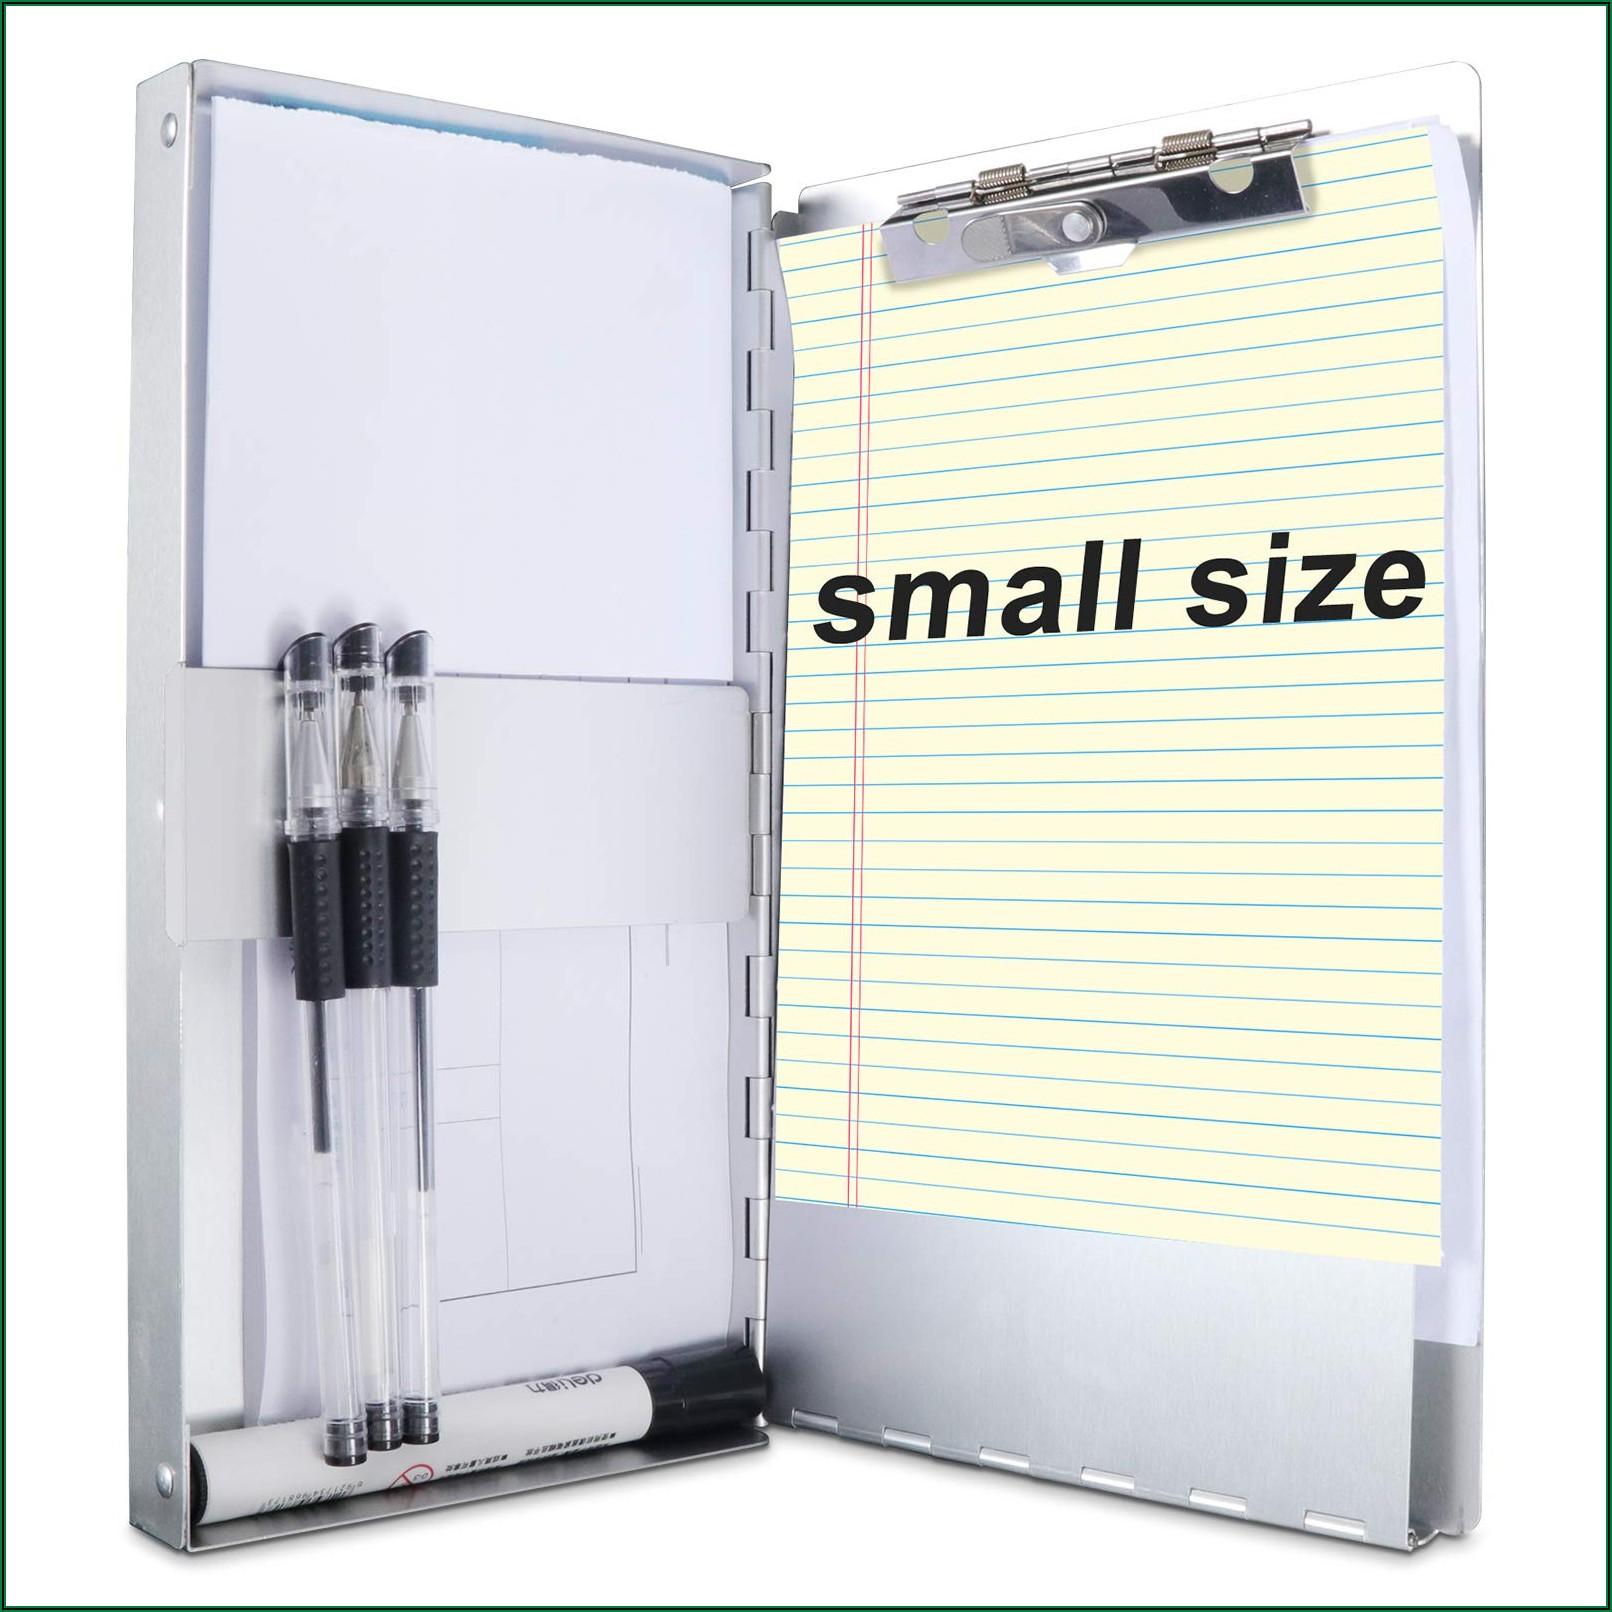 Form Holder Storage Clipboard